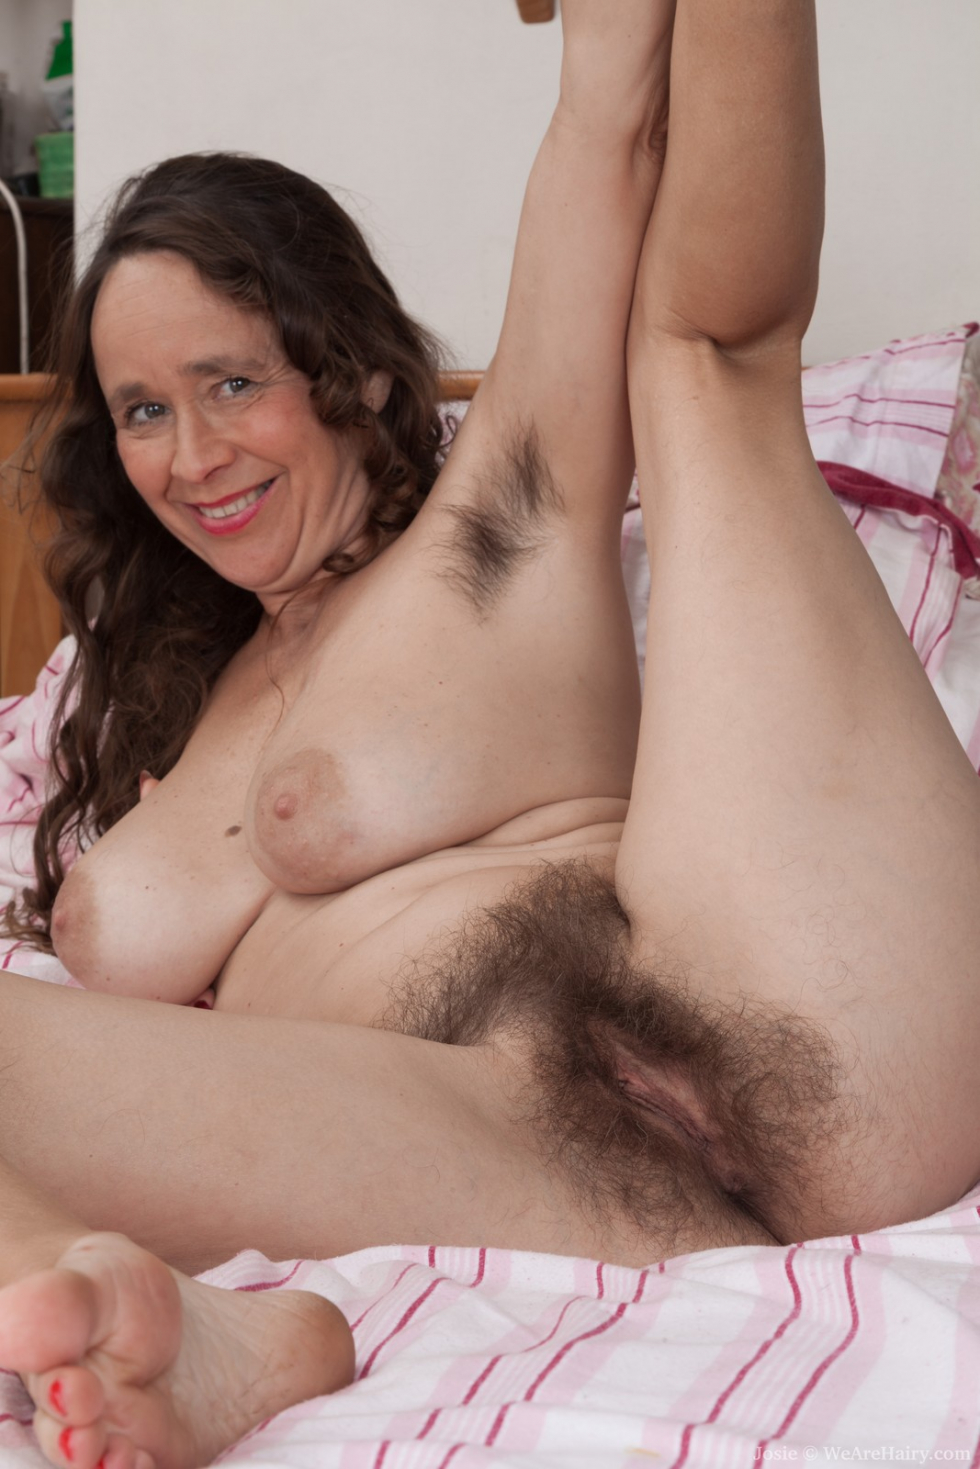 image Beata undine hairy pussy fucked by her boyfriend